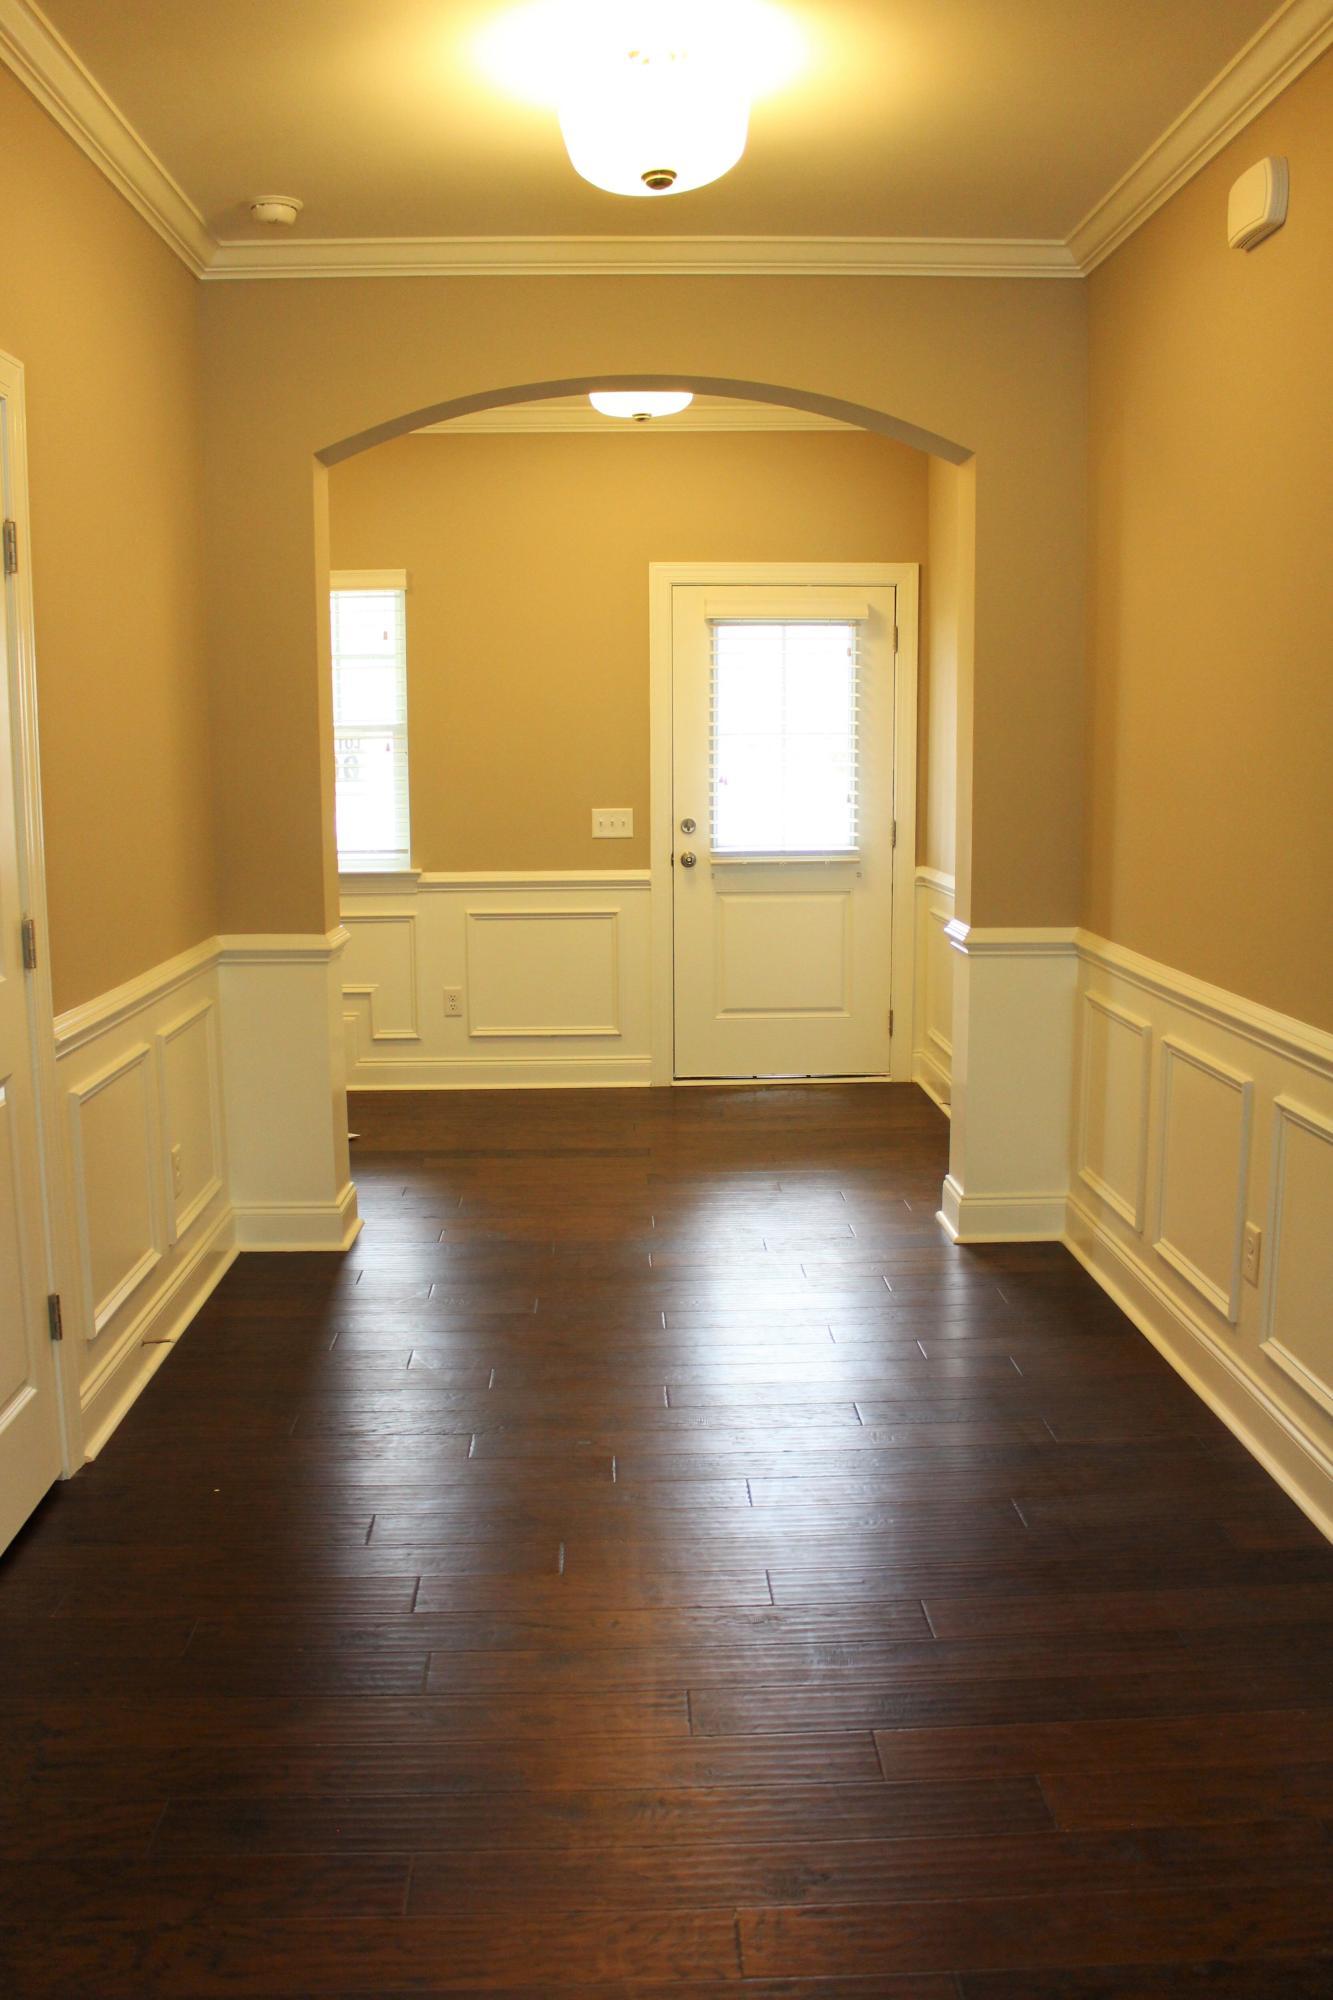 Filbin Creek Homes For Sale - 1173 Sumner, North Charleston, SC - 17